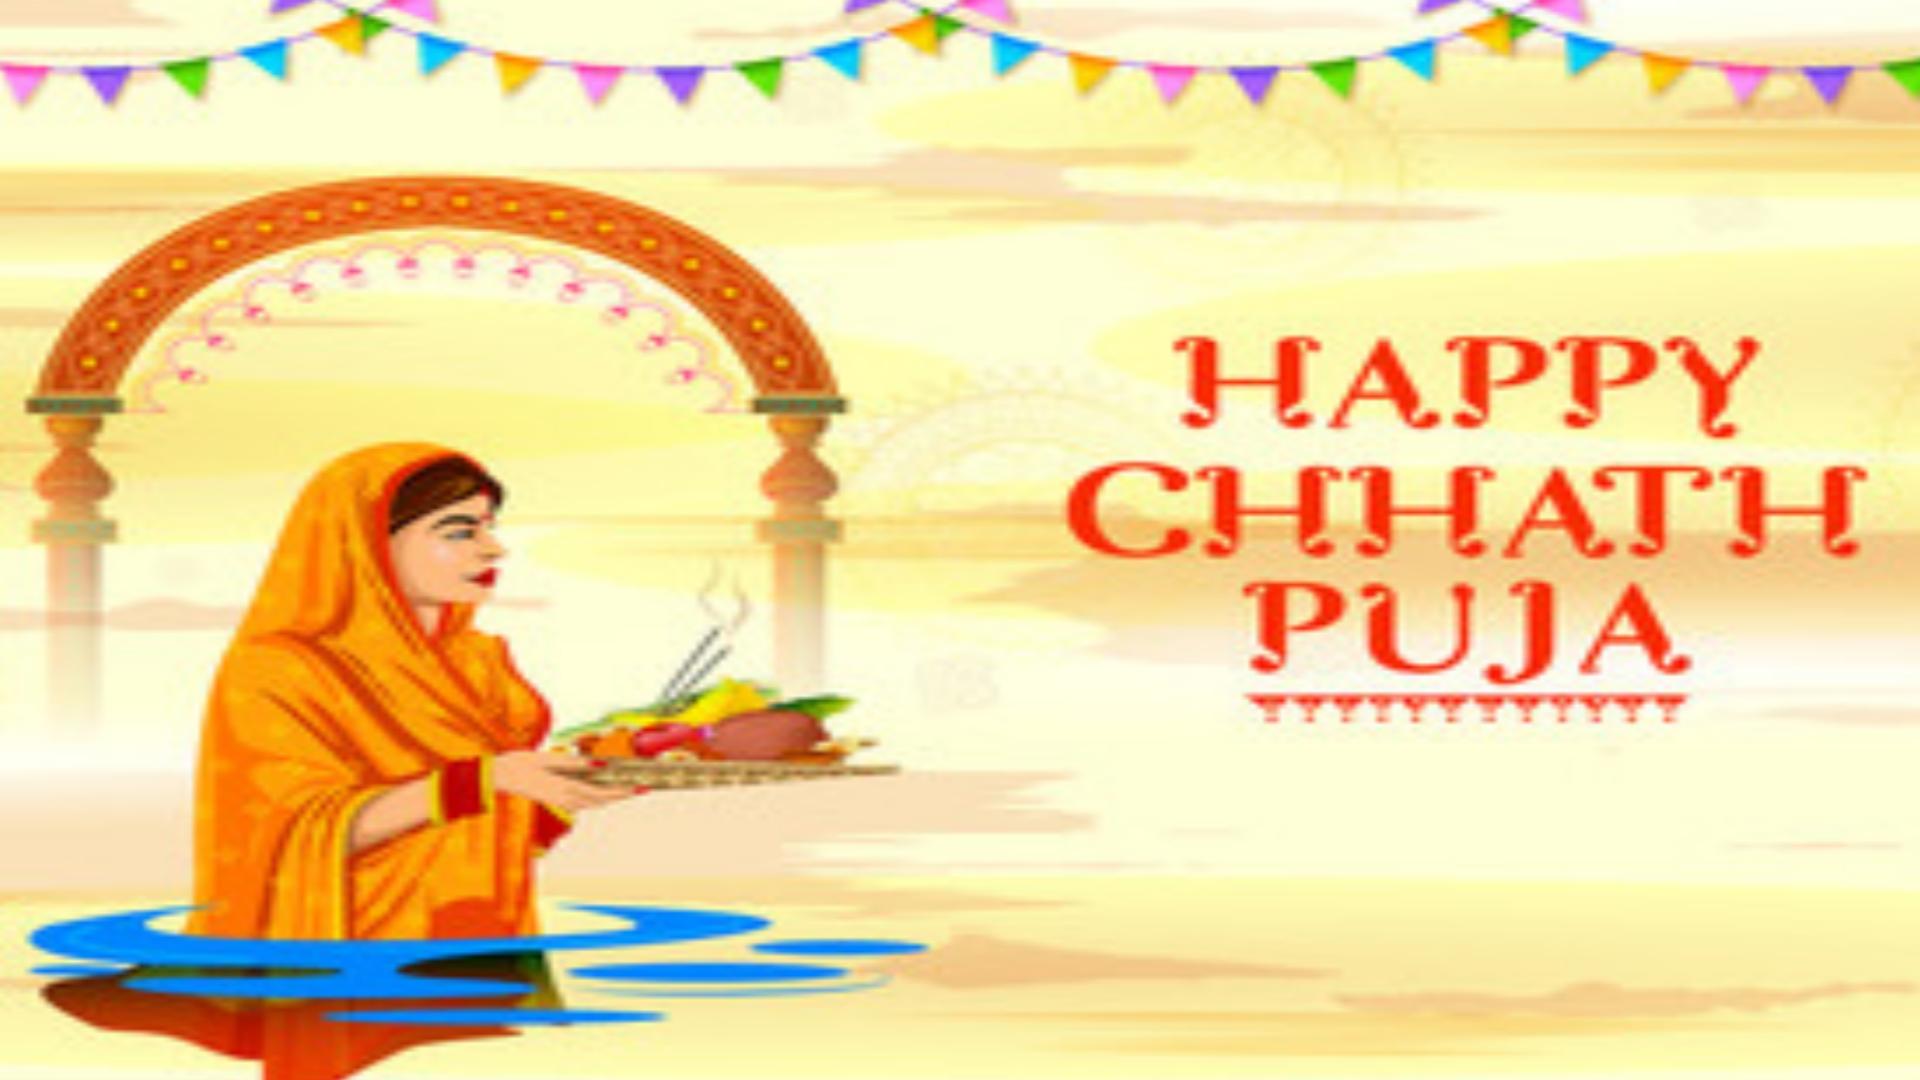 Chhath Pooja Benefits Ingredients and Process - छठ पूजा का महत्व सामग्री और विधि